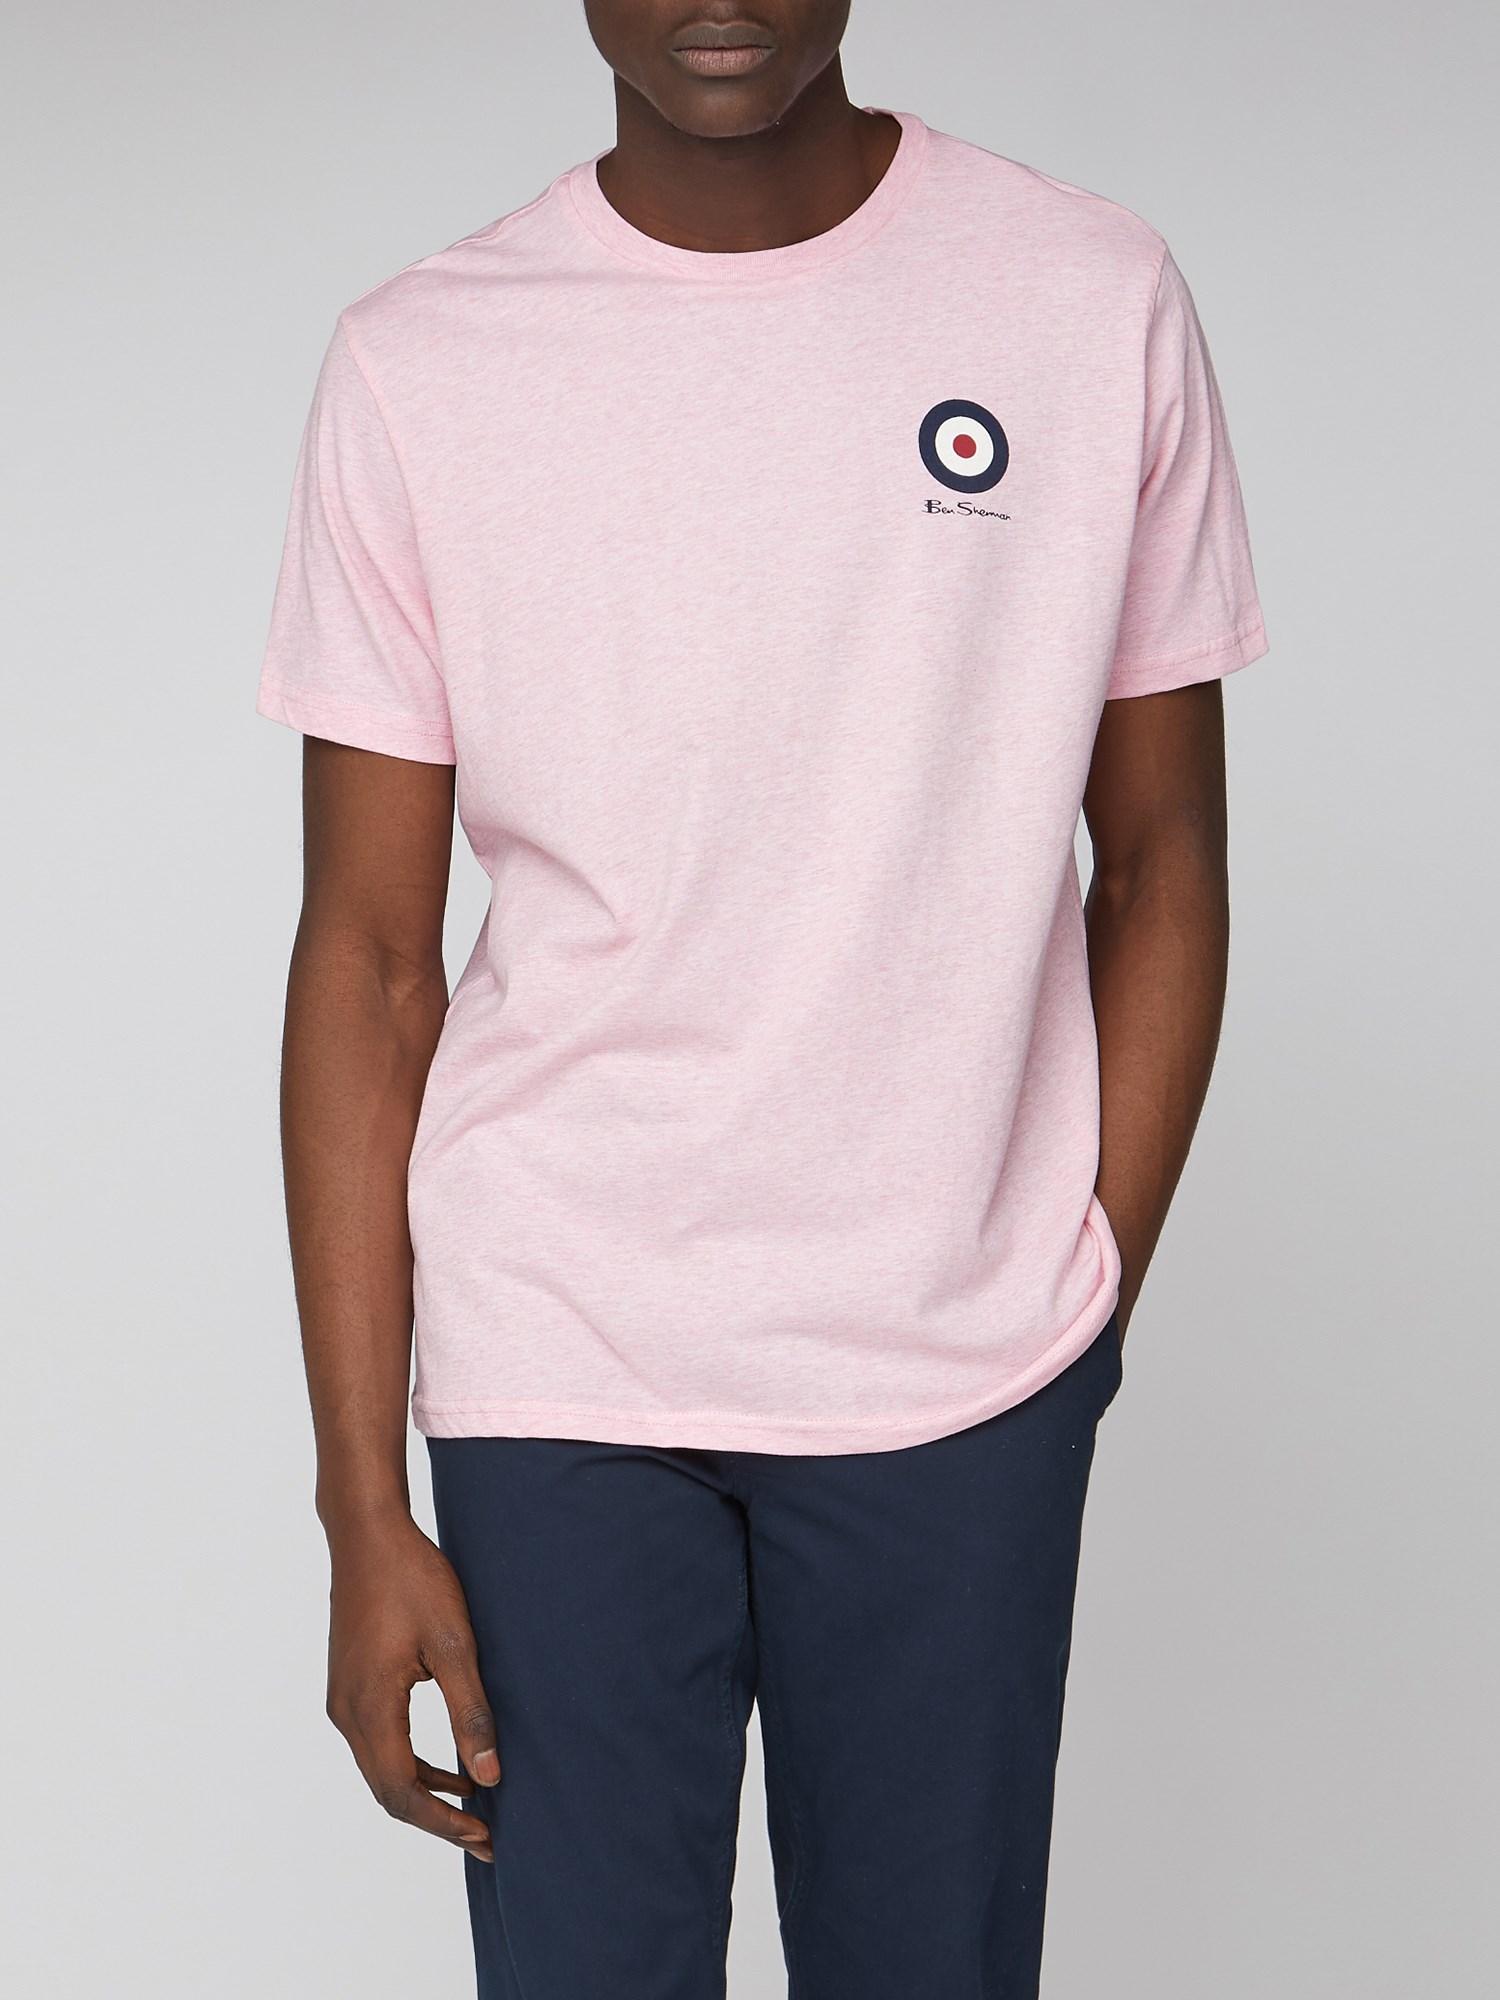 secretamente Regresa Noreste  Pale Pink Men's Emblem Mod Target Tee | Ben Sherman | Est 1963